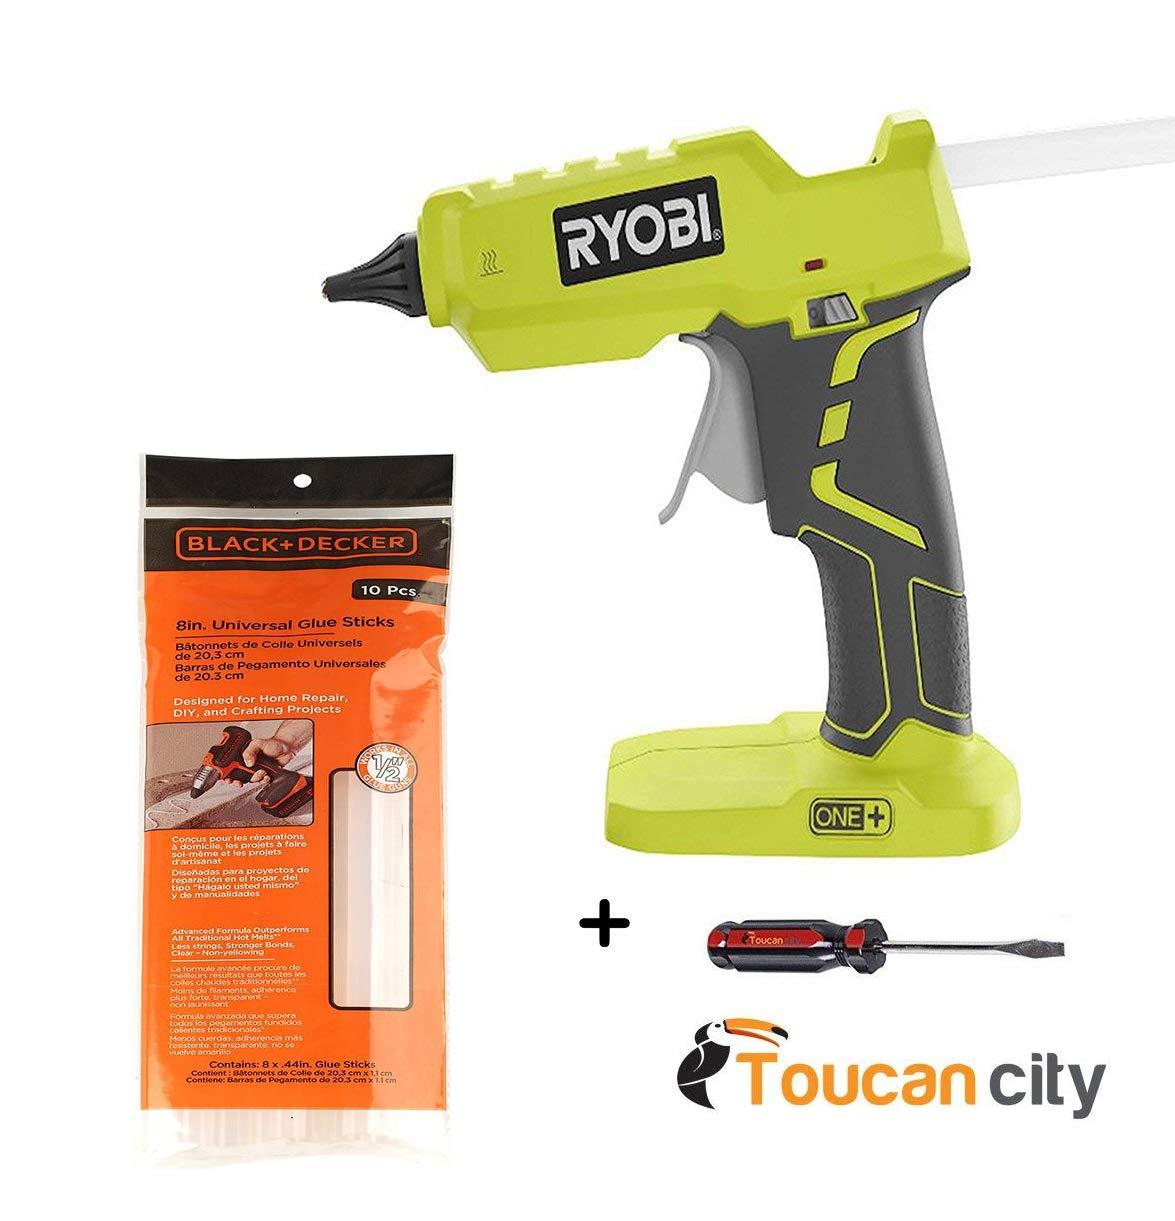 Toucan City Screwdriver + Ryobi 18-Volt ONE+ Glue Gun P305 + 8 in. x 7/16 in. Dia All Purpose Full Size Glue Sticks (10-Pcs) by Toucan City